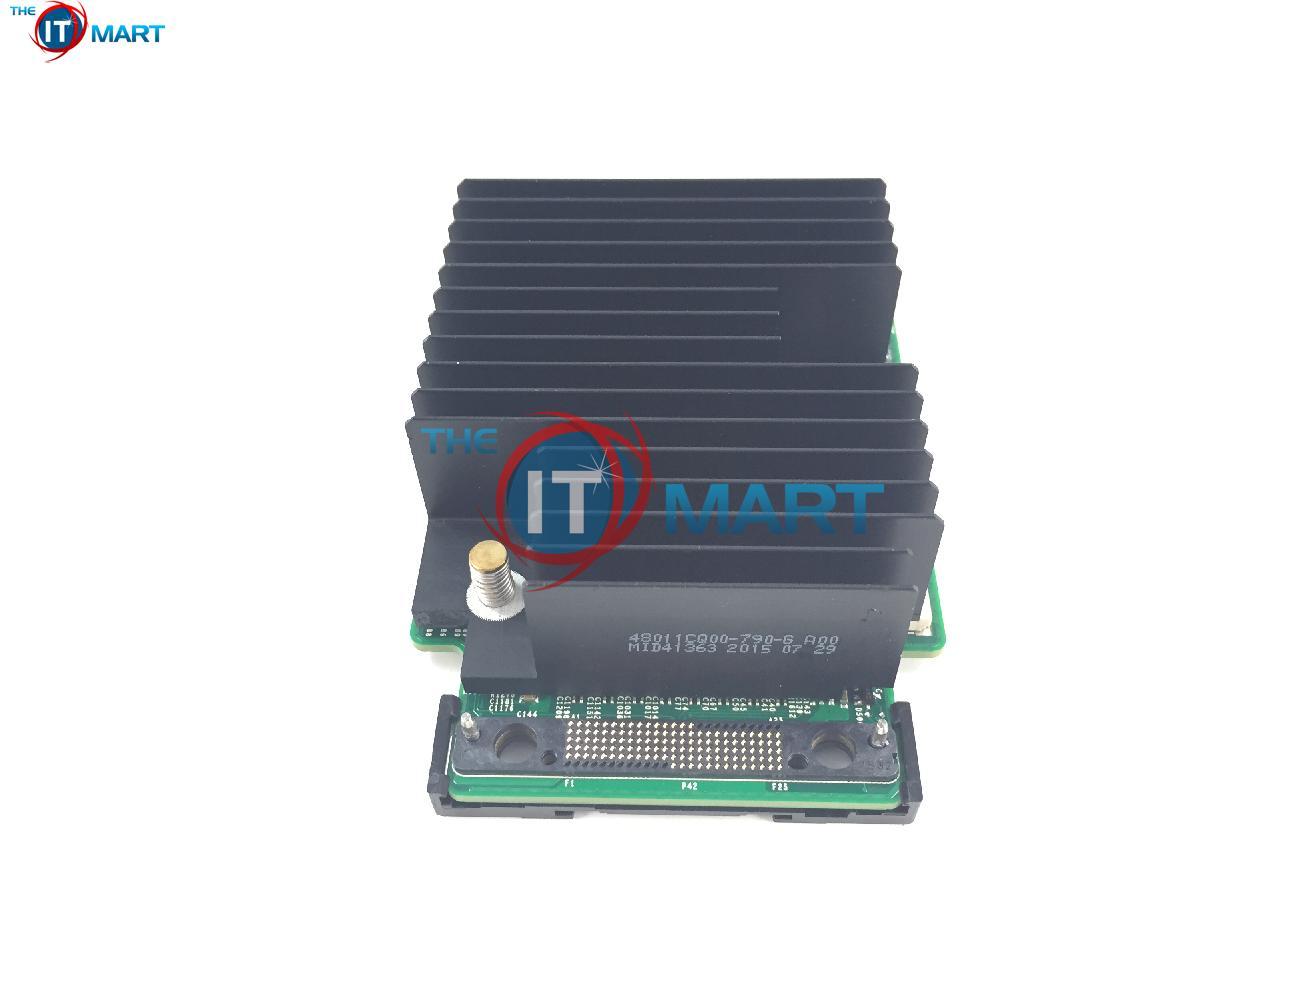 DELL PERC H330 MINI MONO 12GBPS SAS/SATA RAID CONTROLLER (GDJ3J)